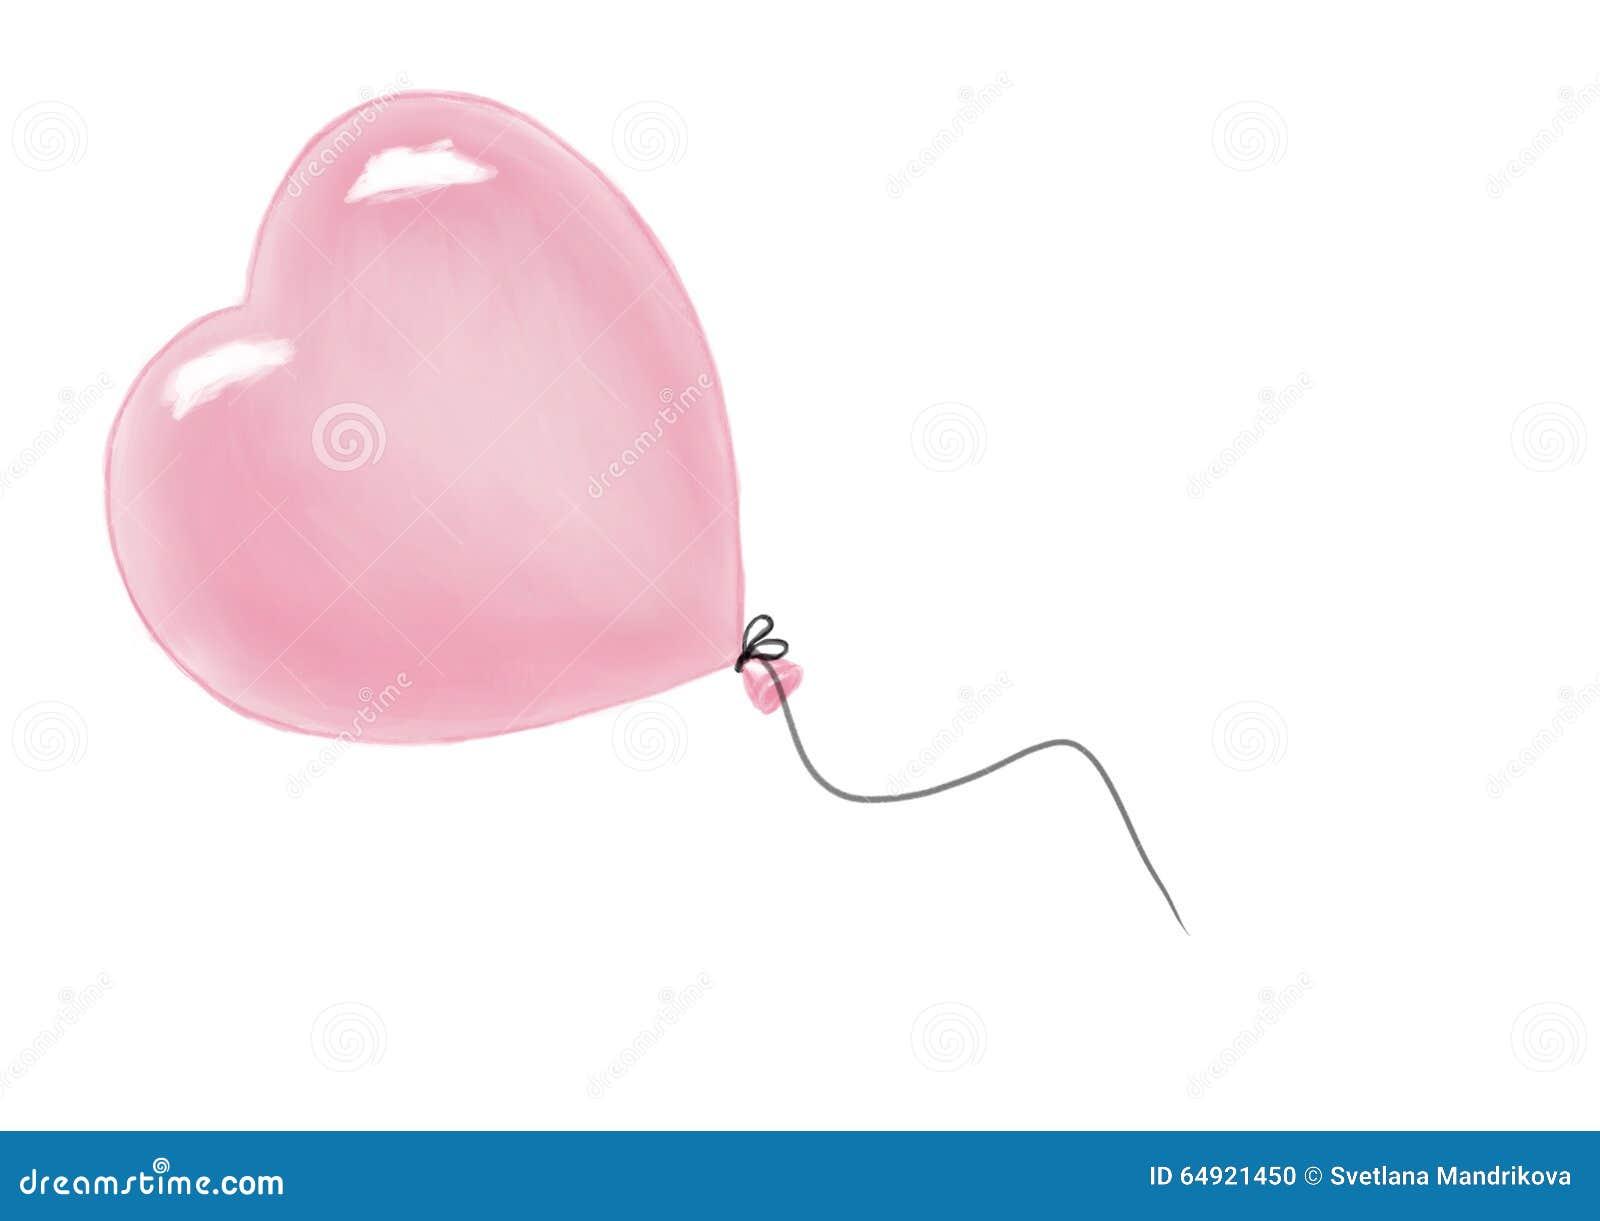 Ballon à air de forme de coeur